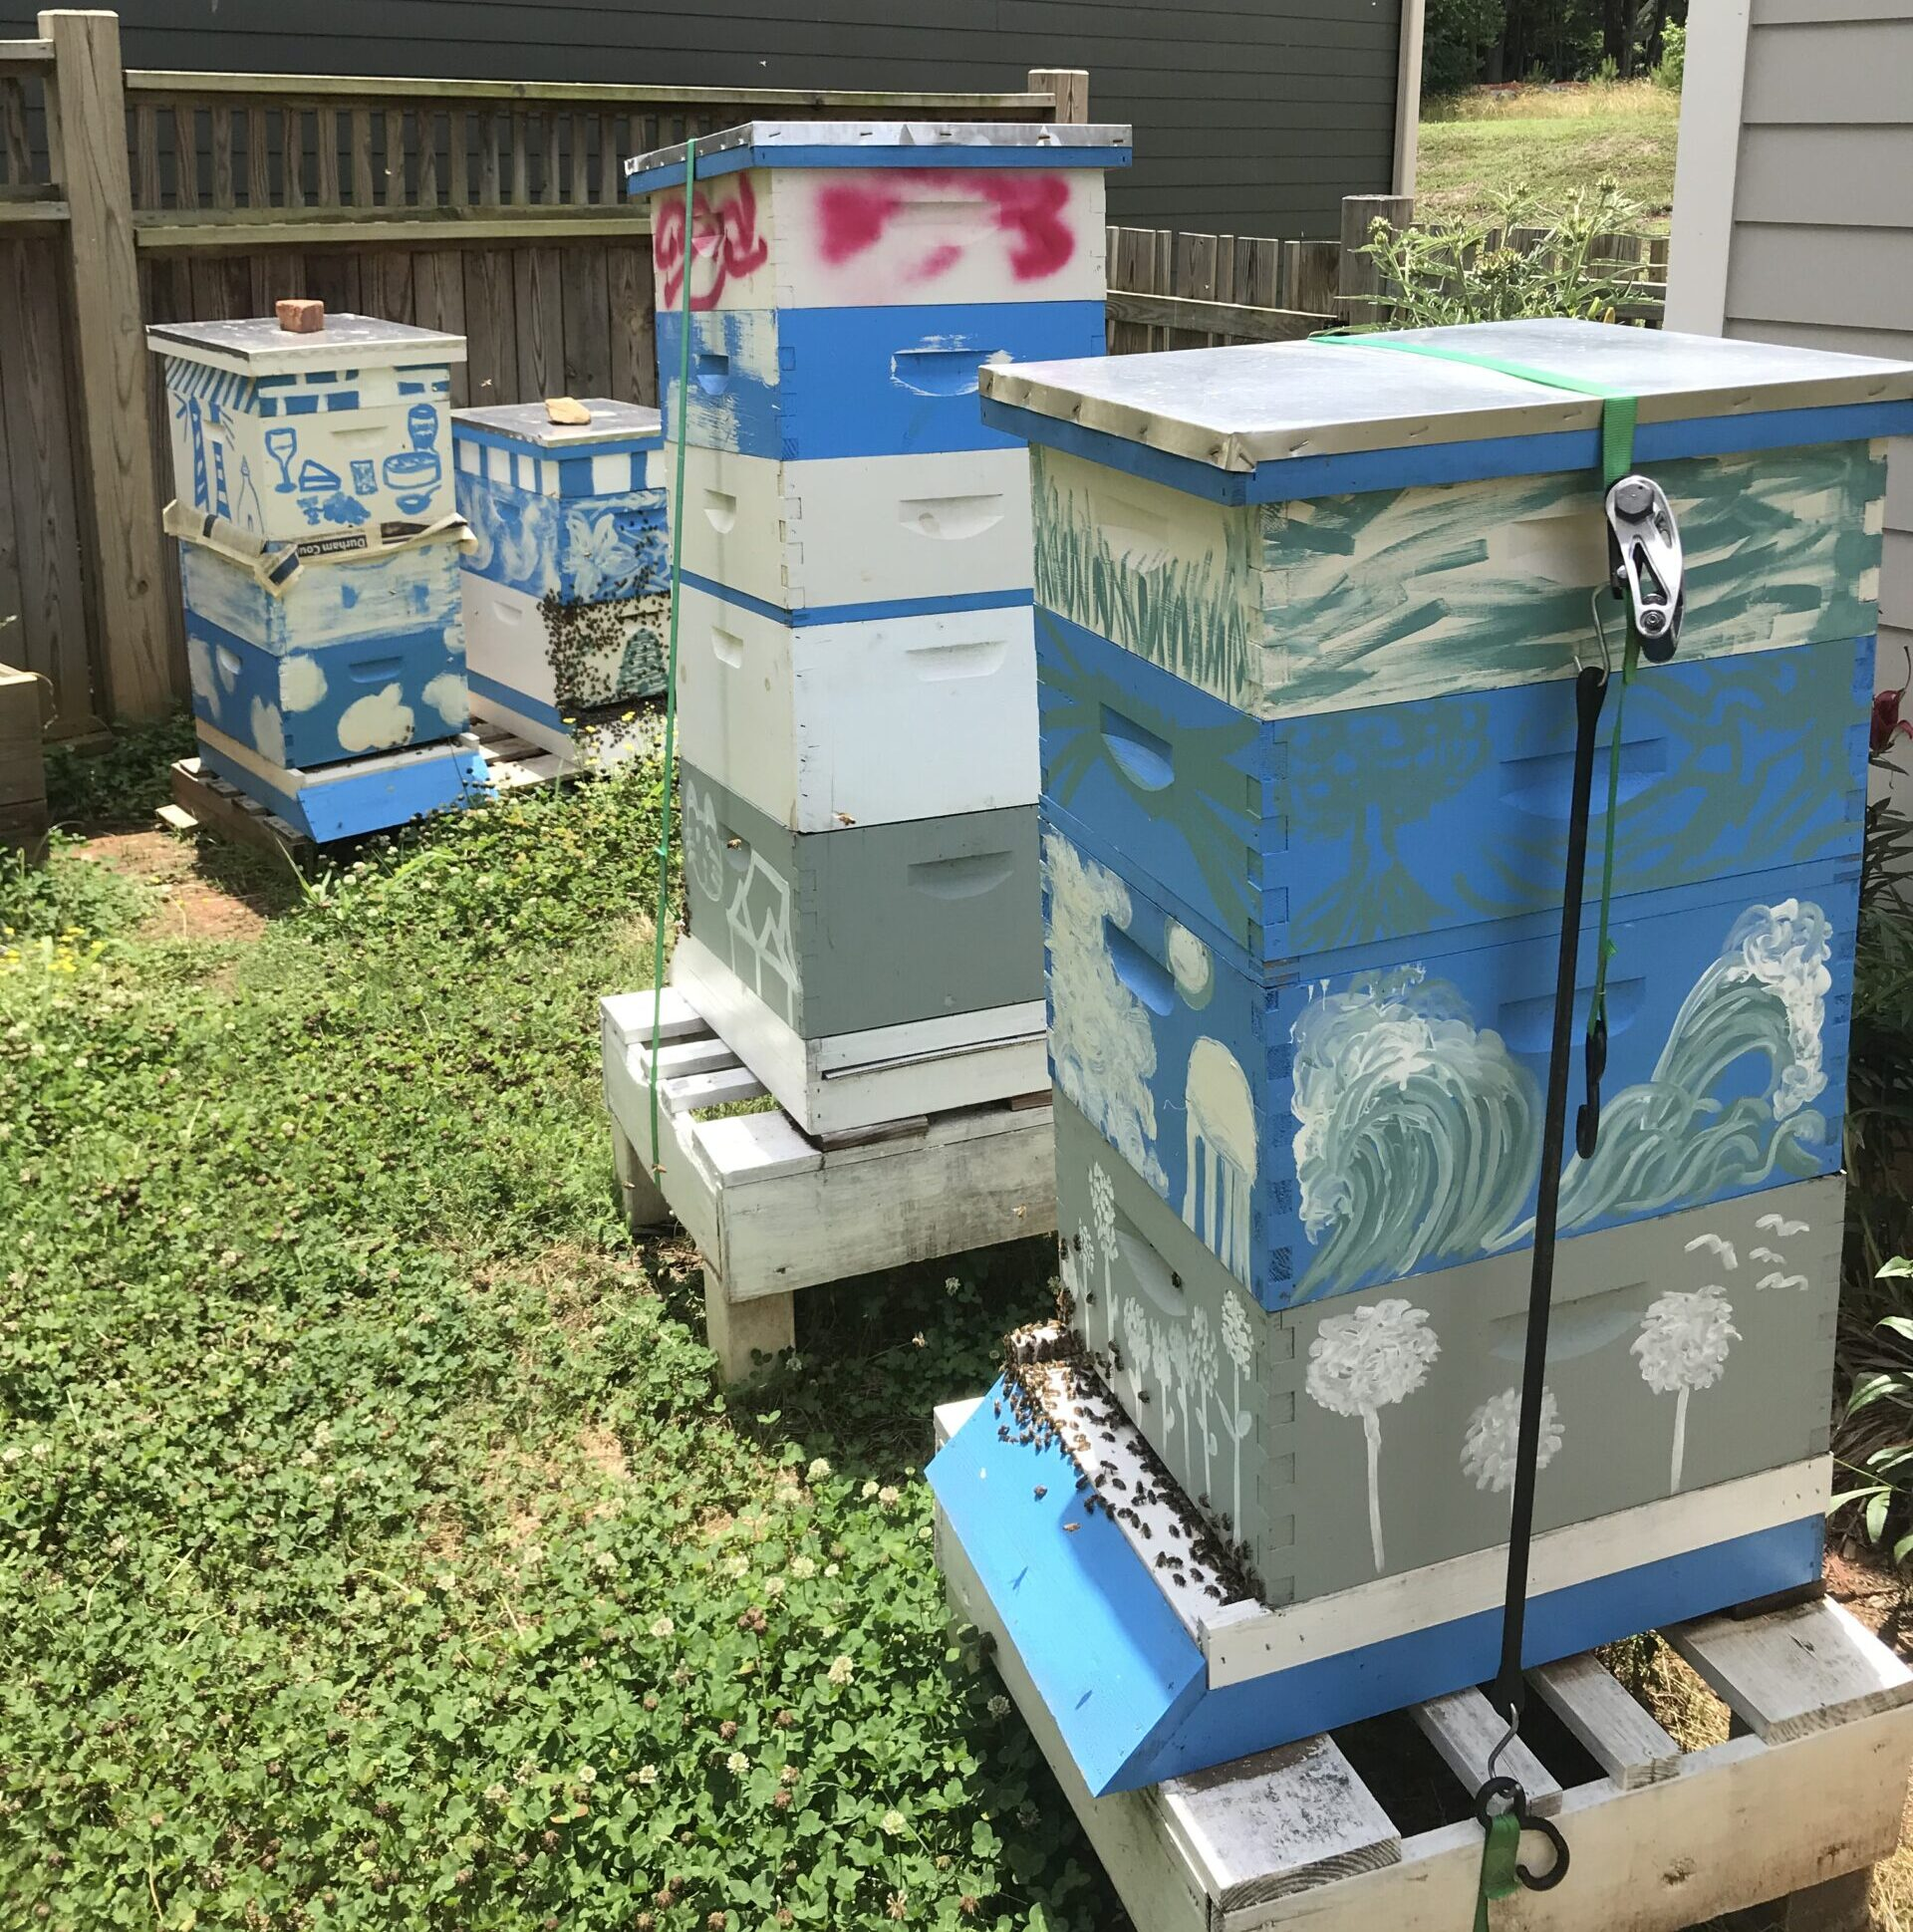 Beekeeping boxes.